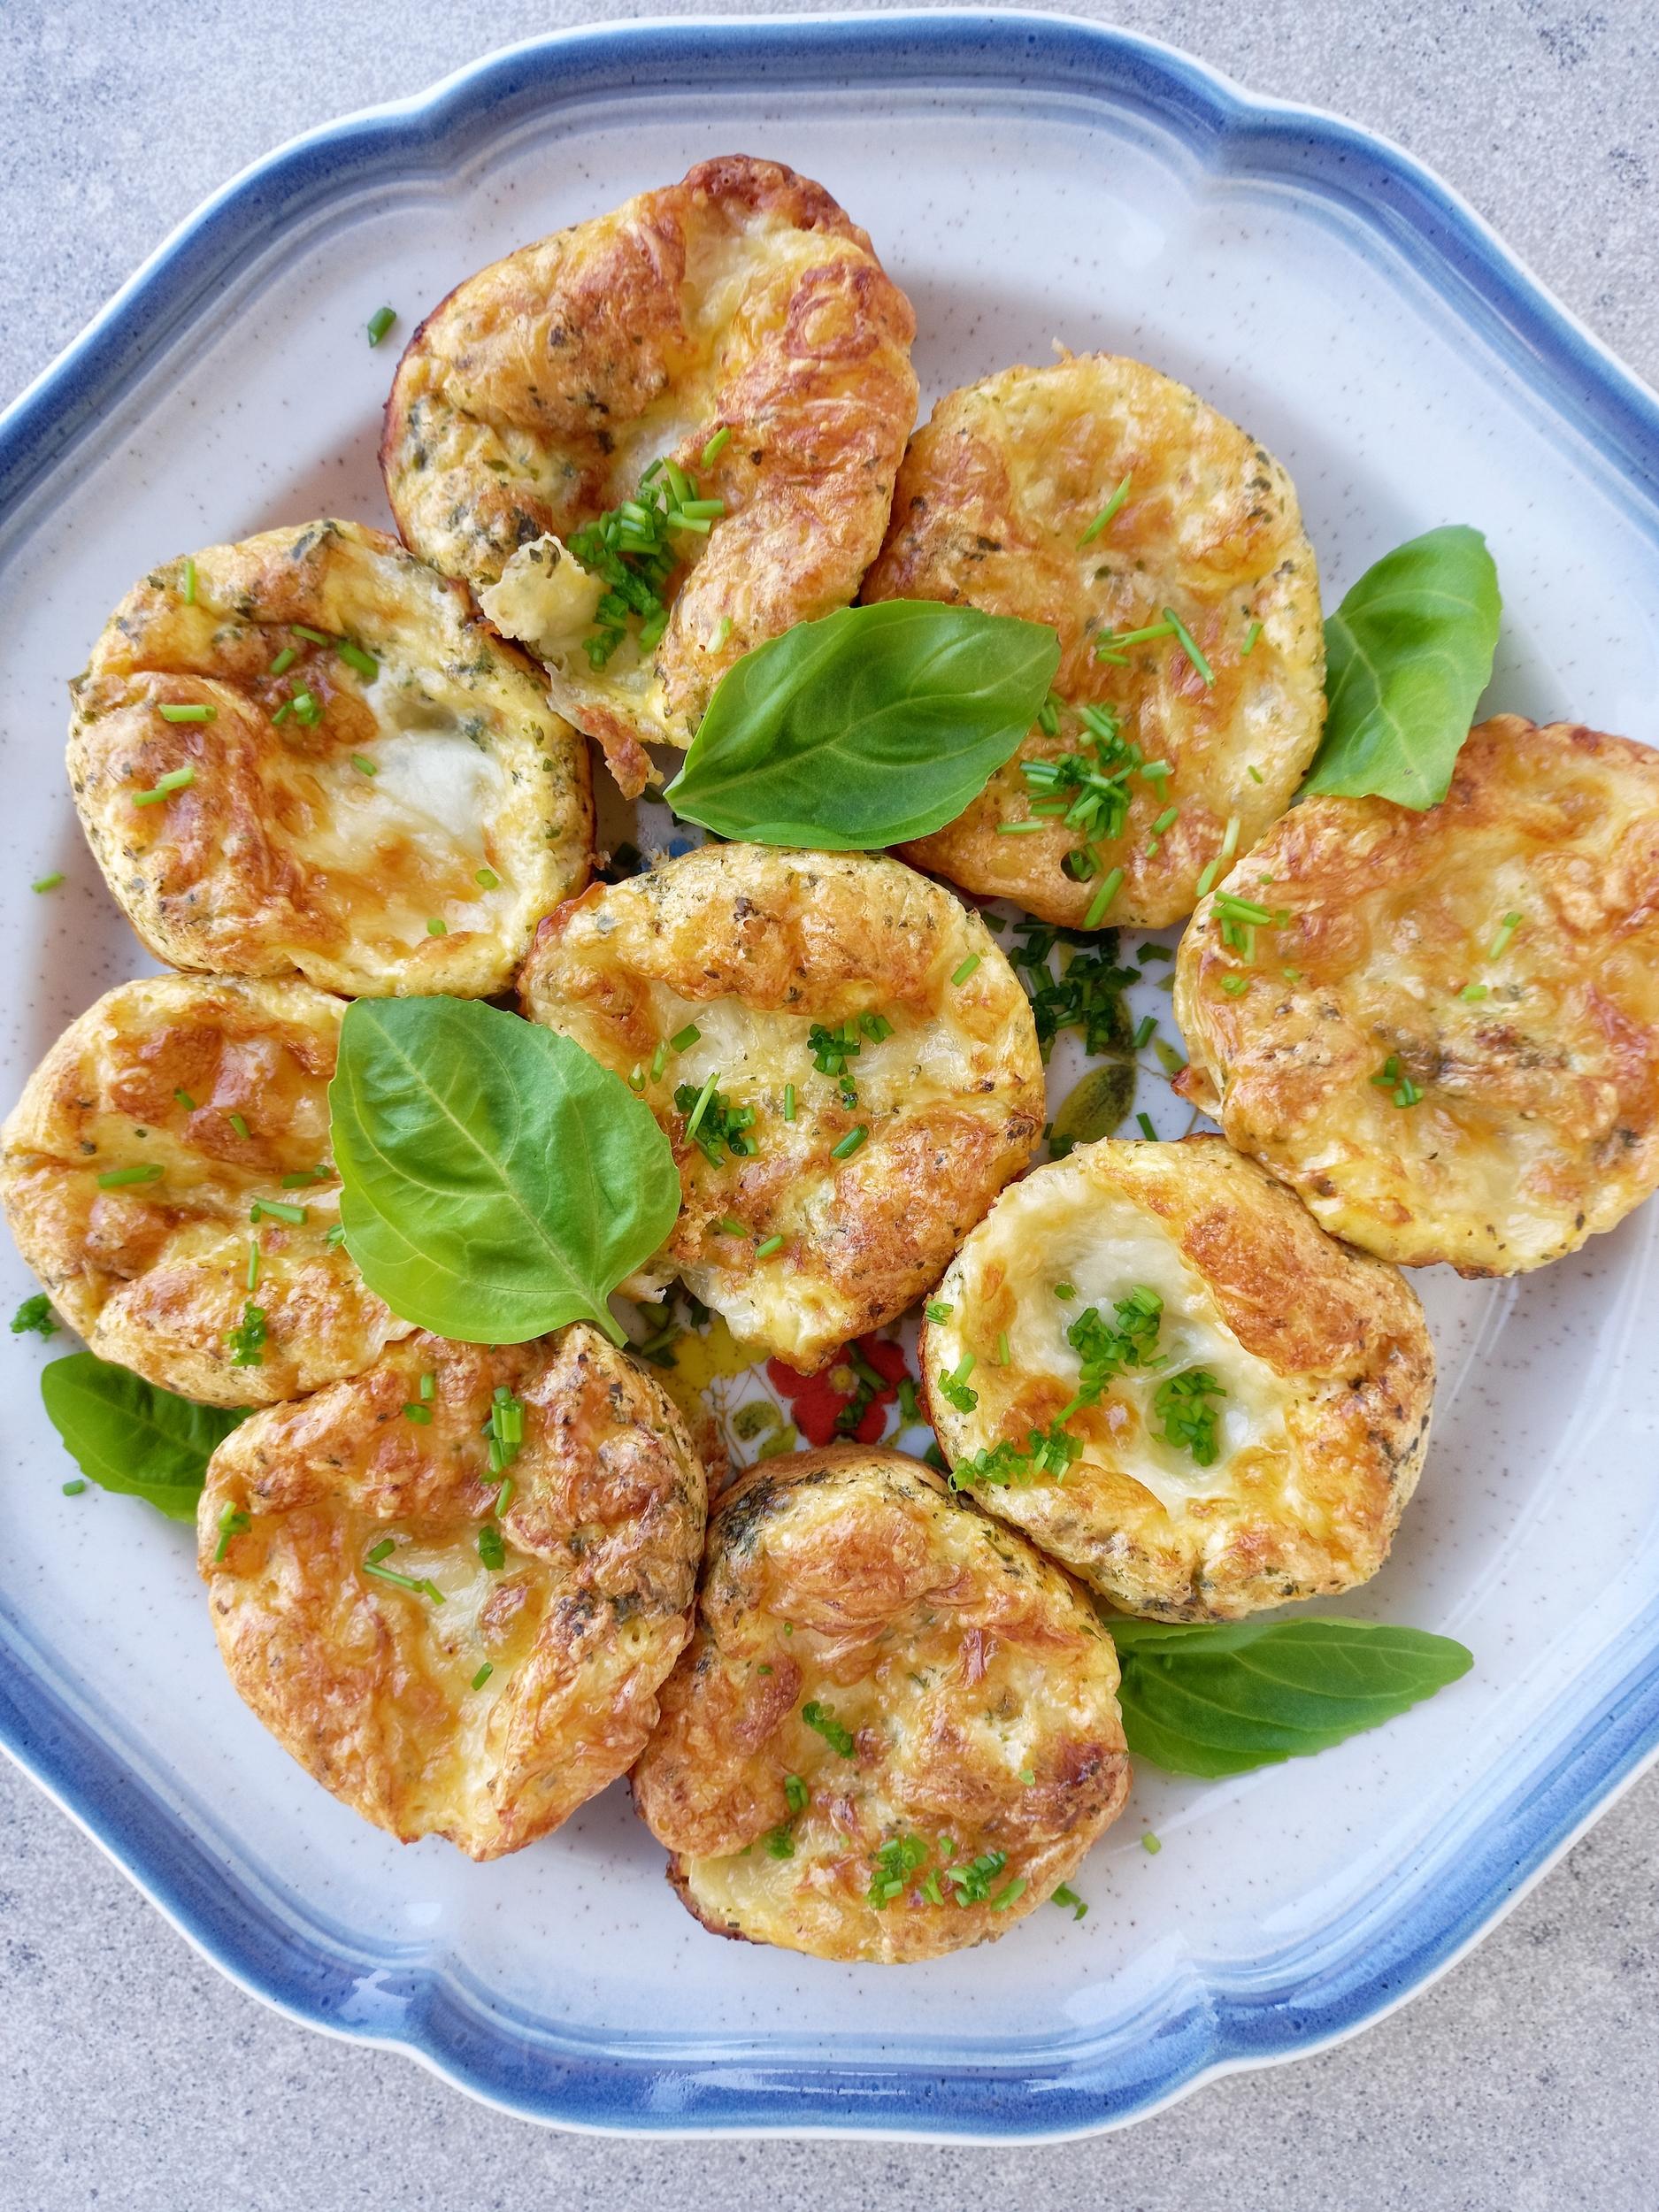 Sajtos-sonkás tojásmuffin